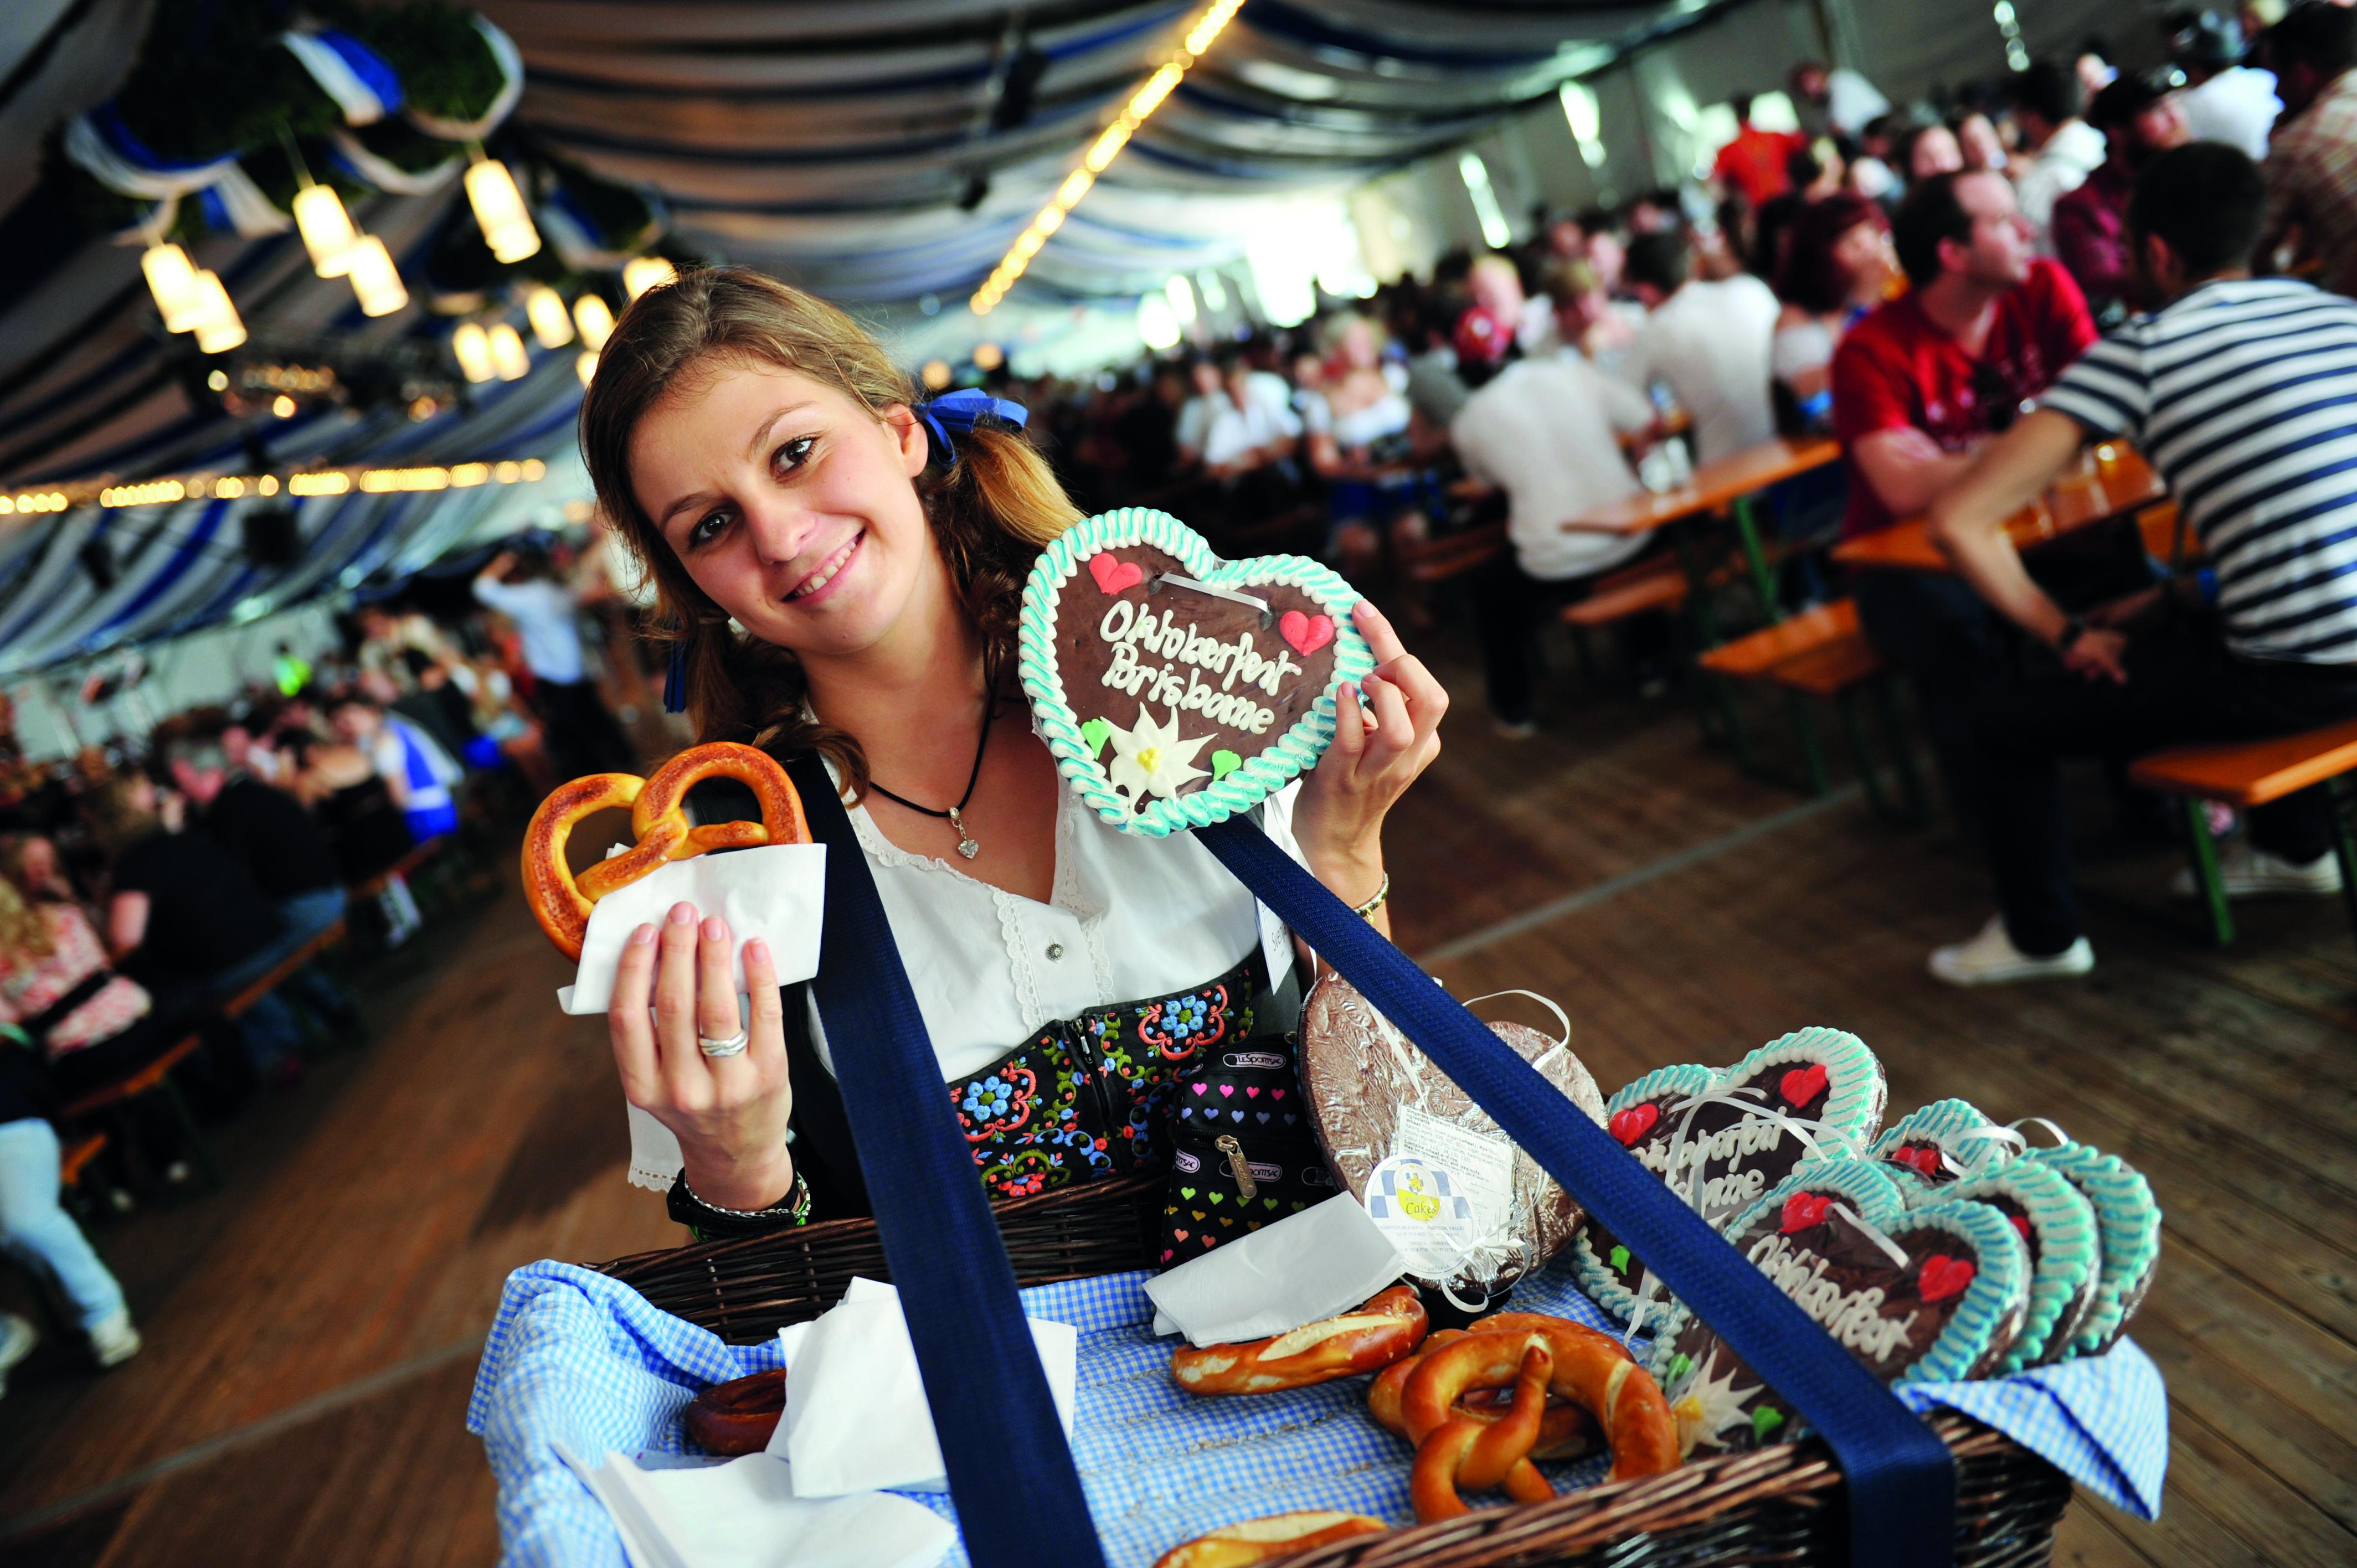 OktoberfestBris-Hearts.jpg